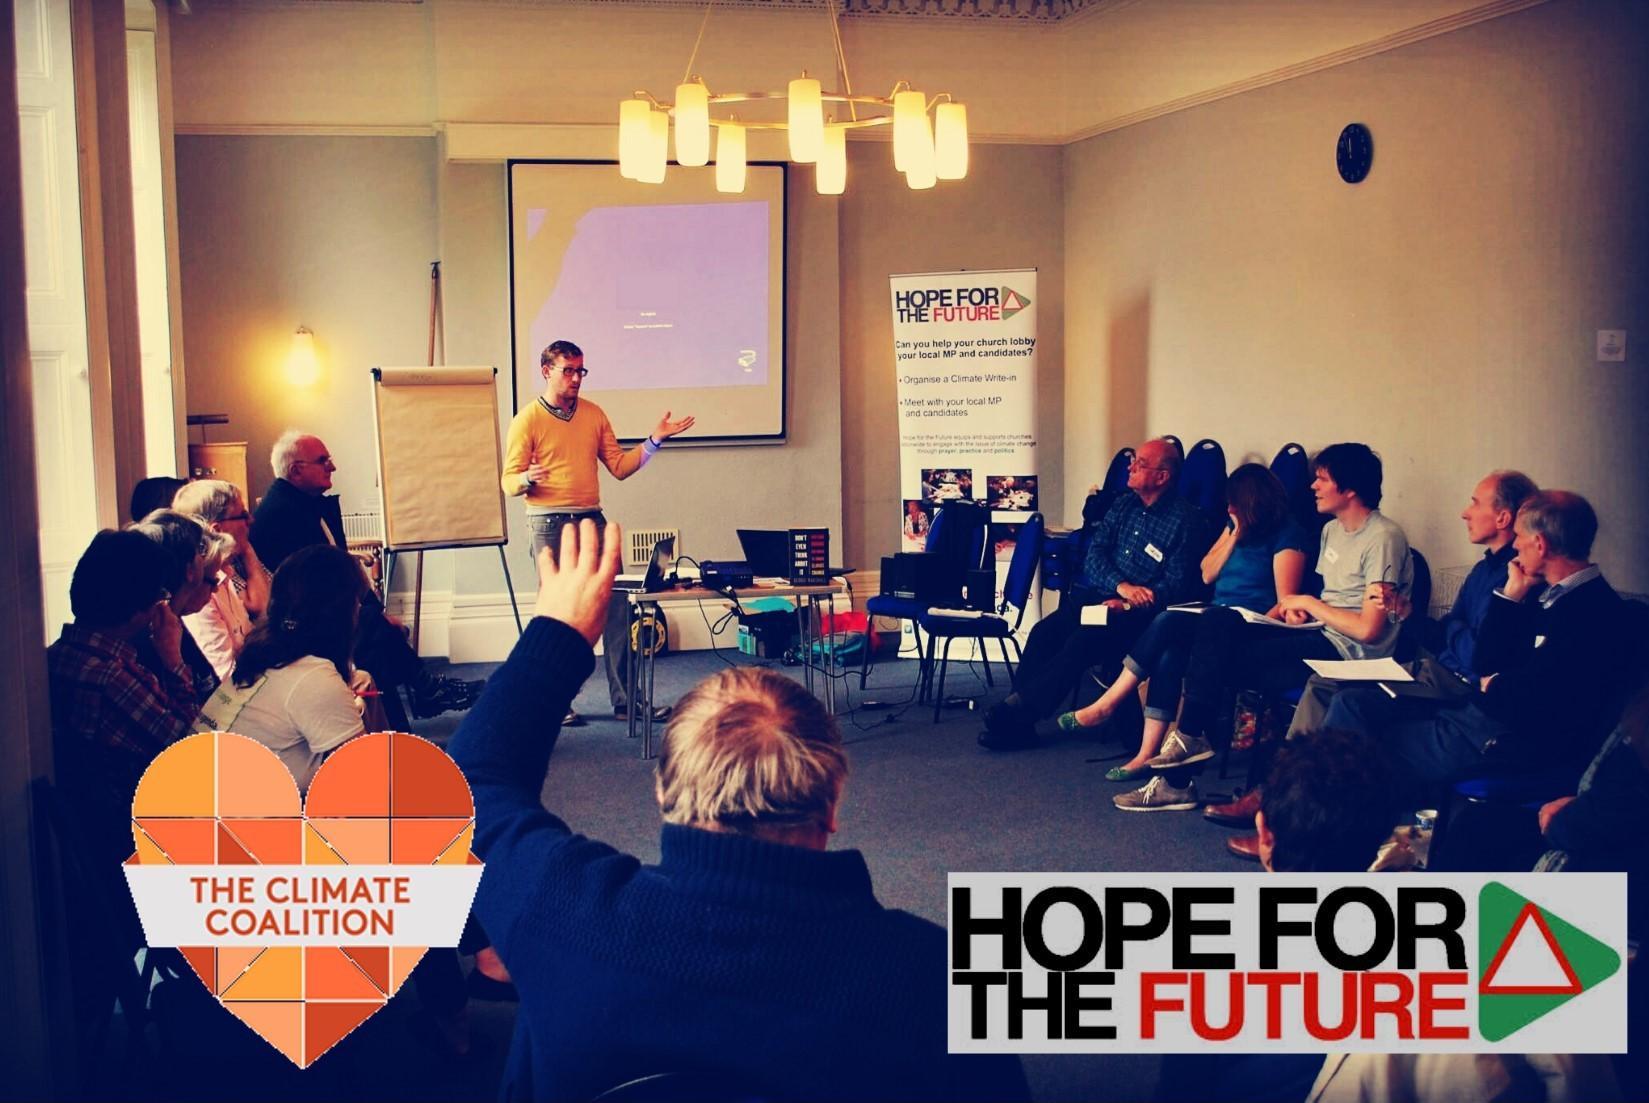 Week of Action, Climate Lobby Training - Manc